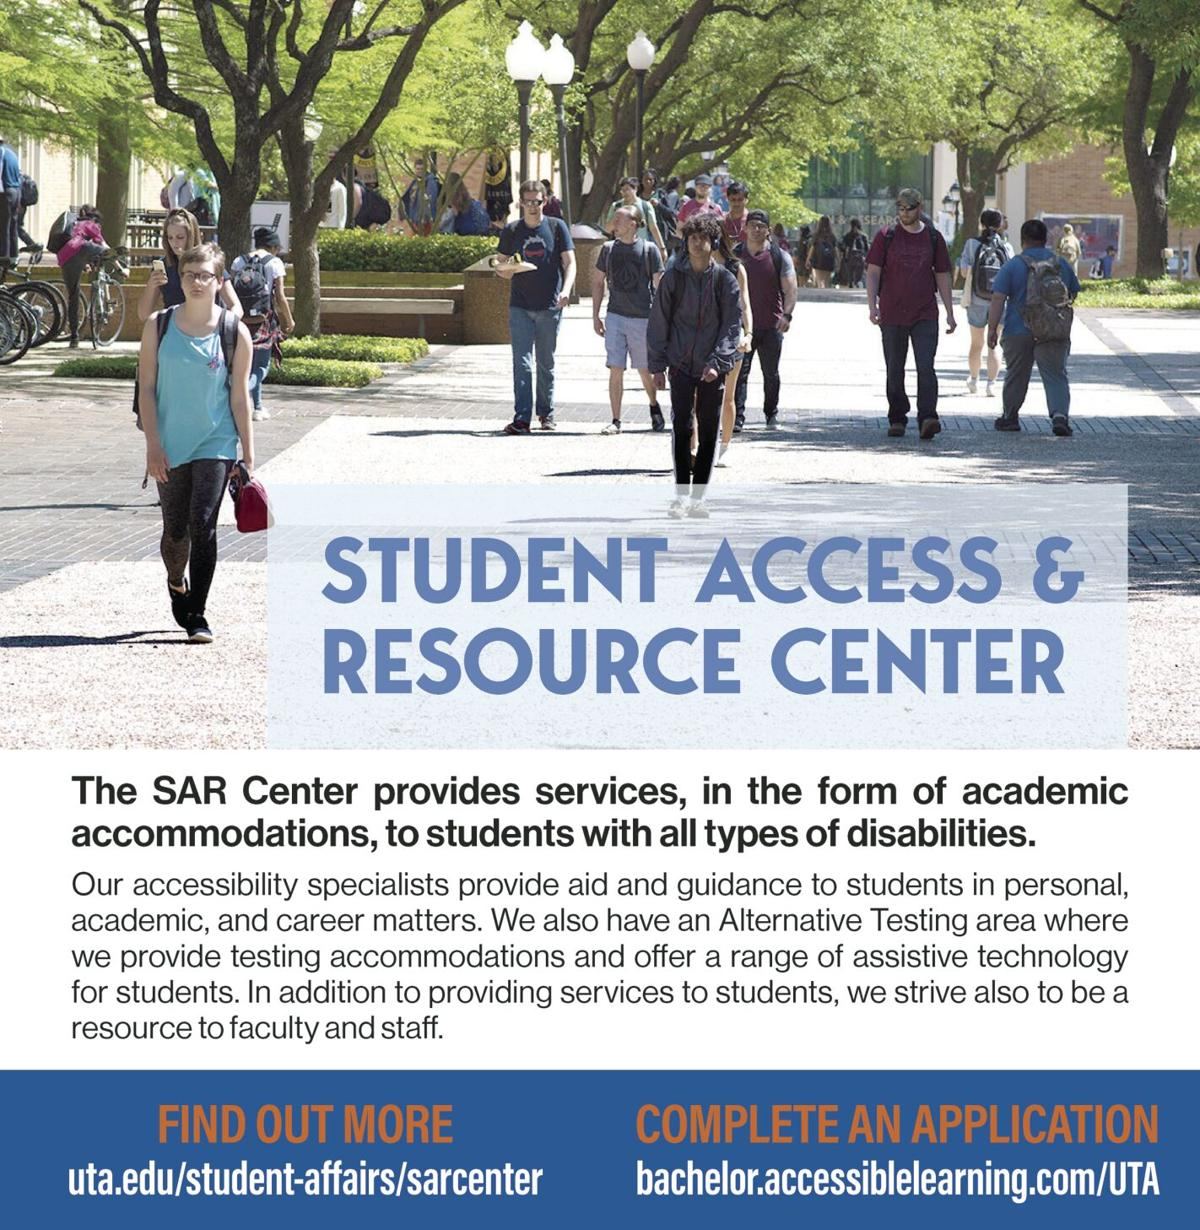 UTA Student Access & Resource Center